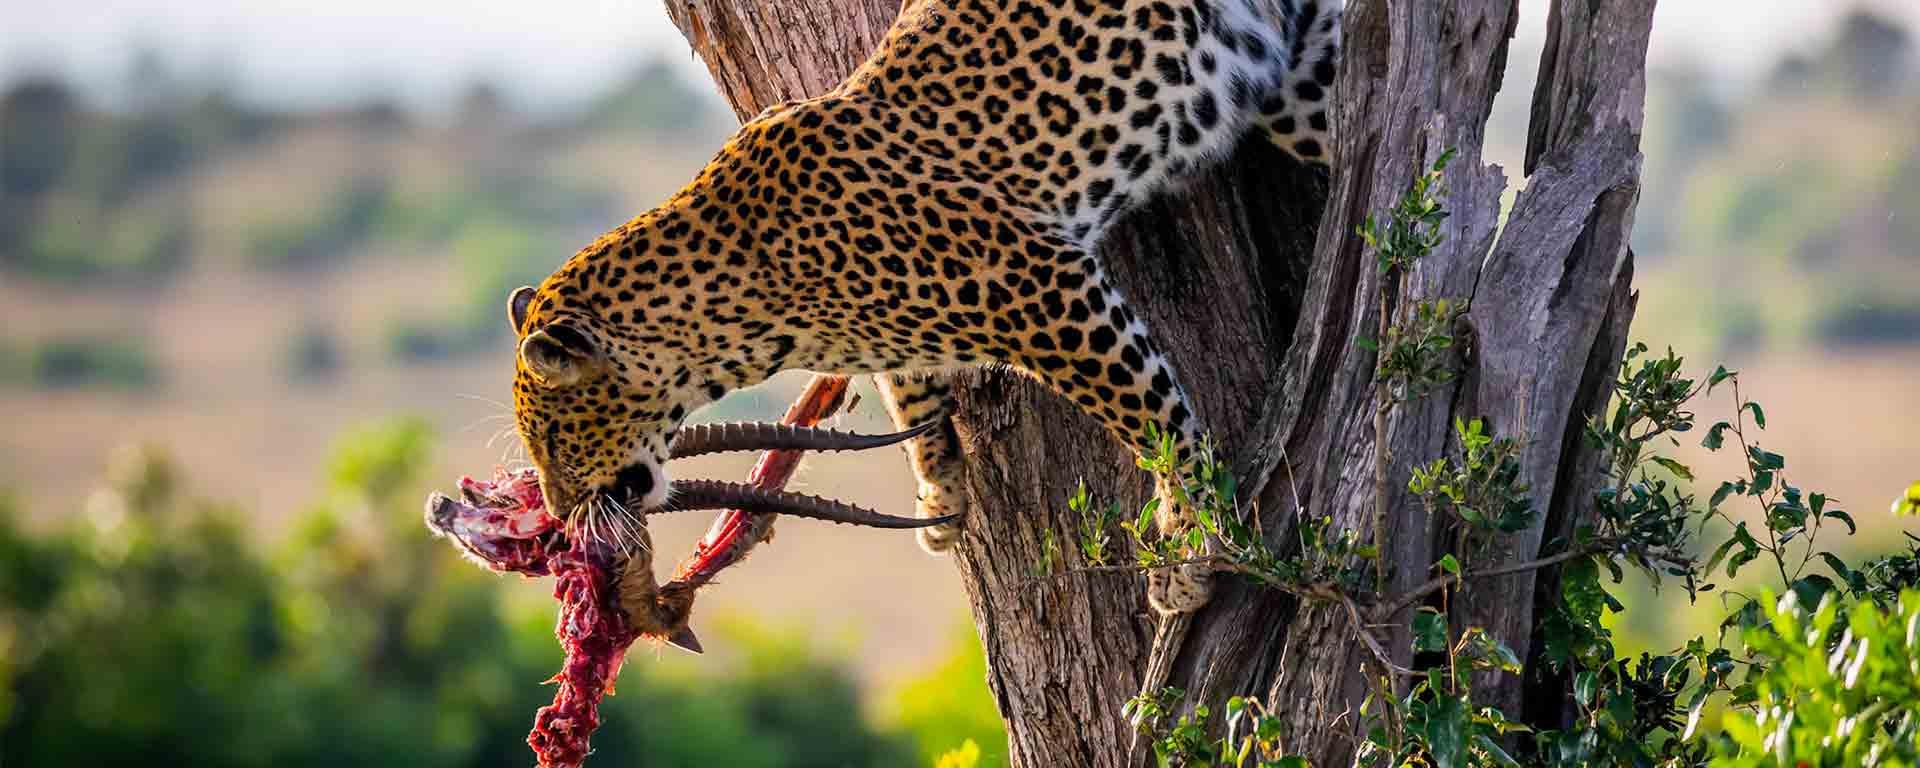 cheetah Asili Adventure Safaris Ltd